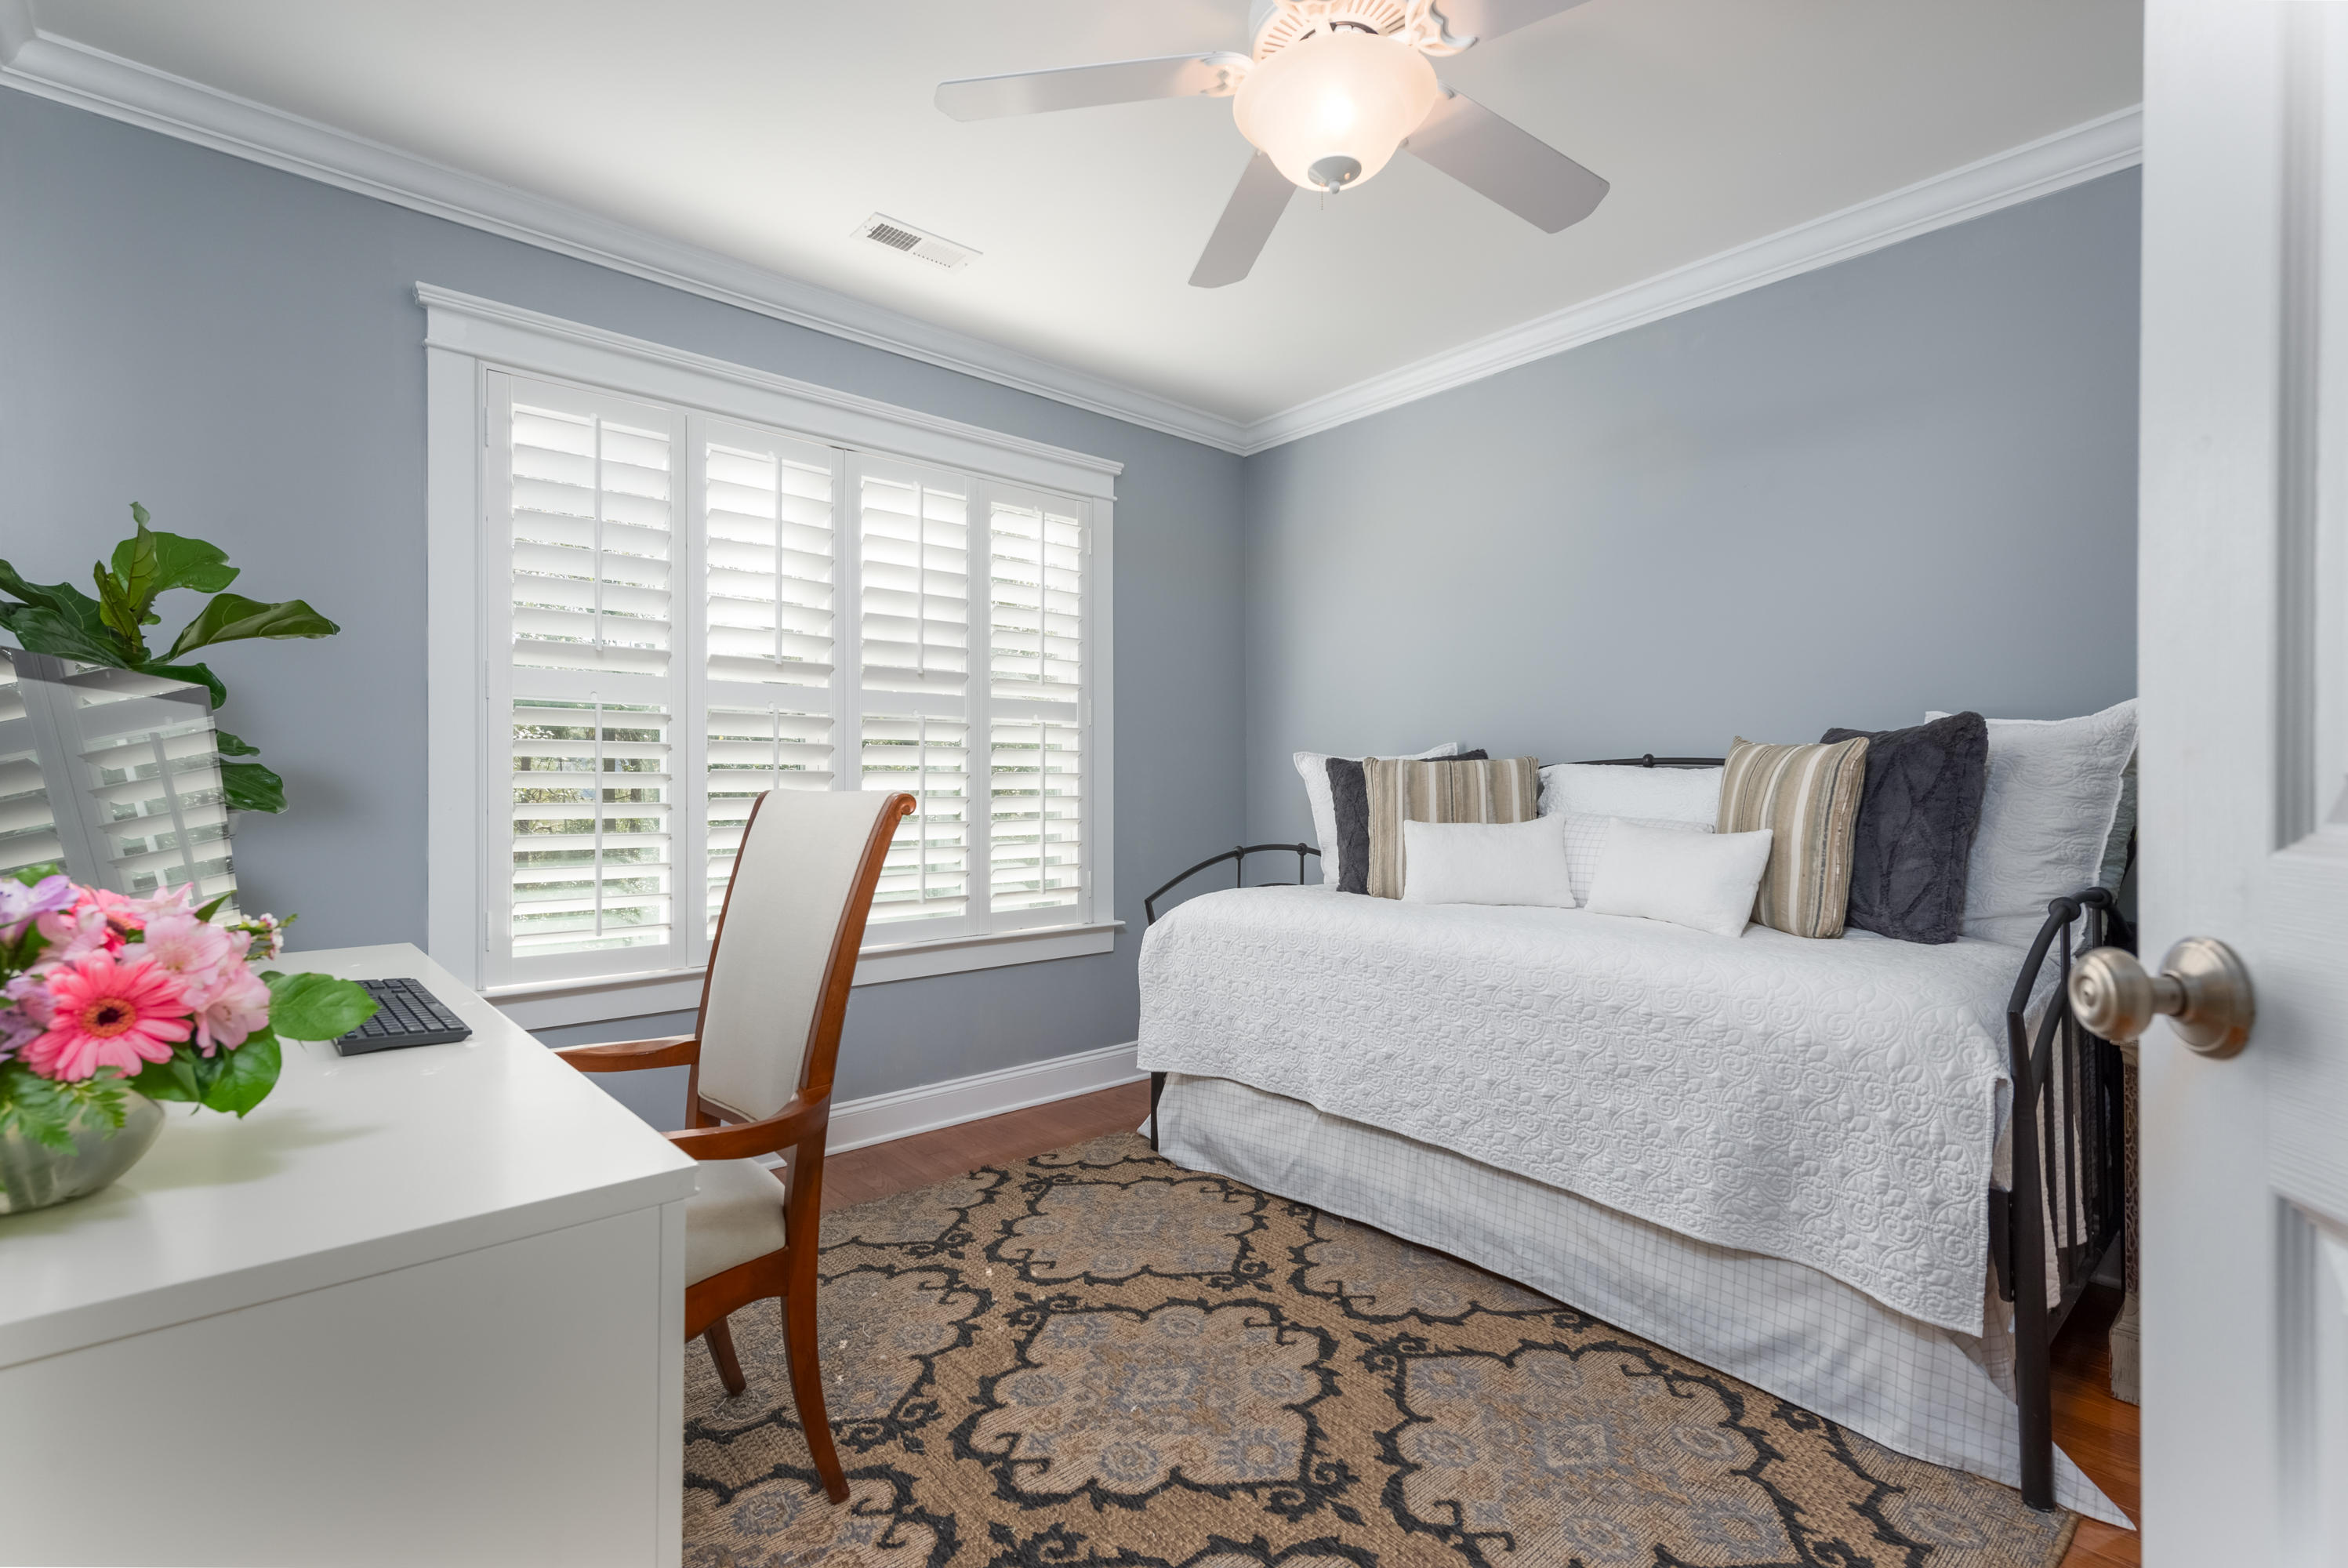 Carol Oaks Homes For Sale - 2813 Caitlins, Mount Pleasant, SC - 15